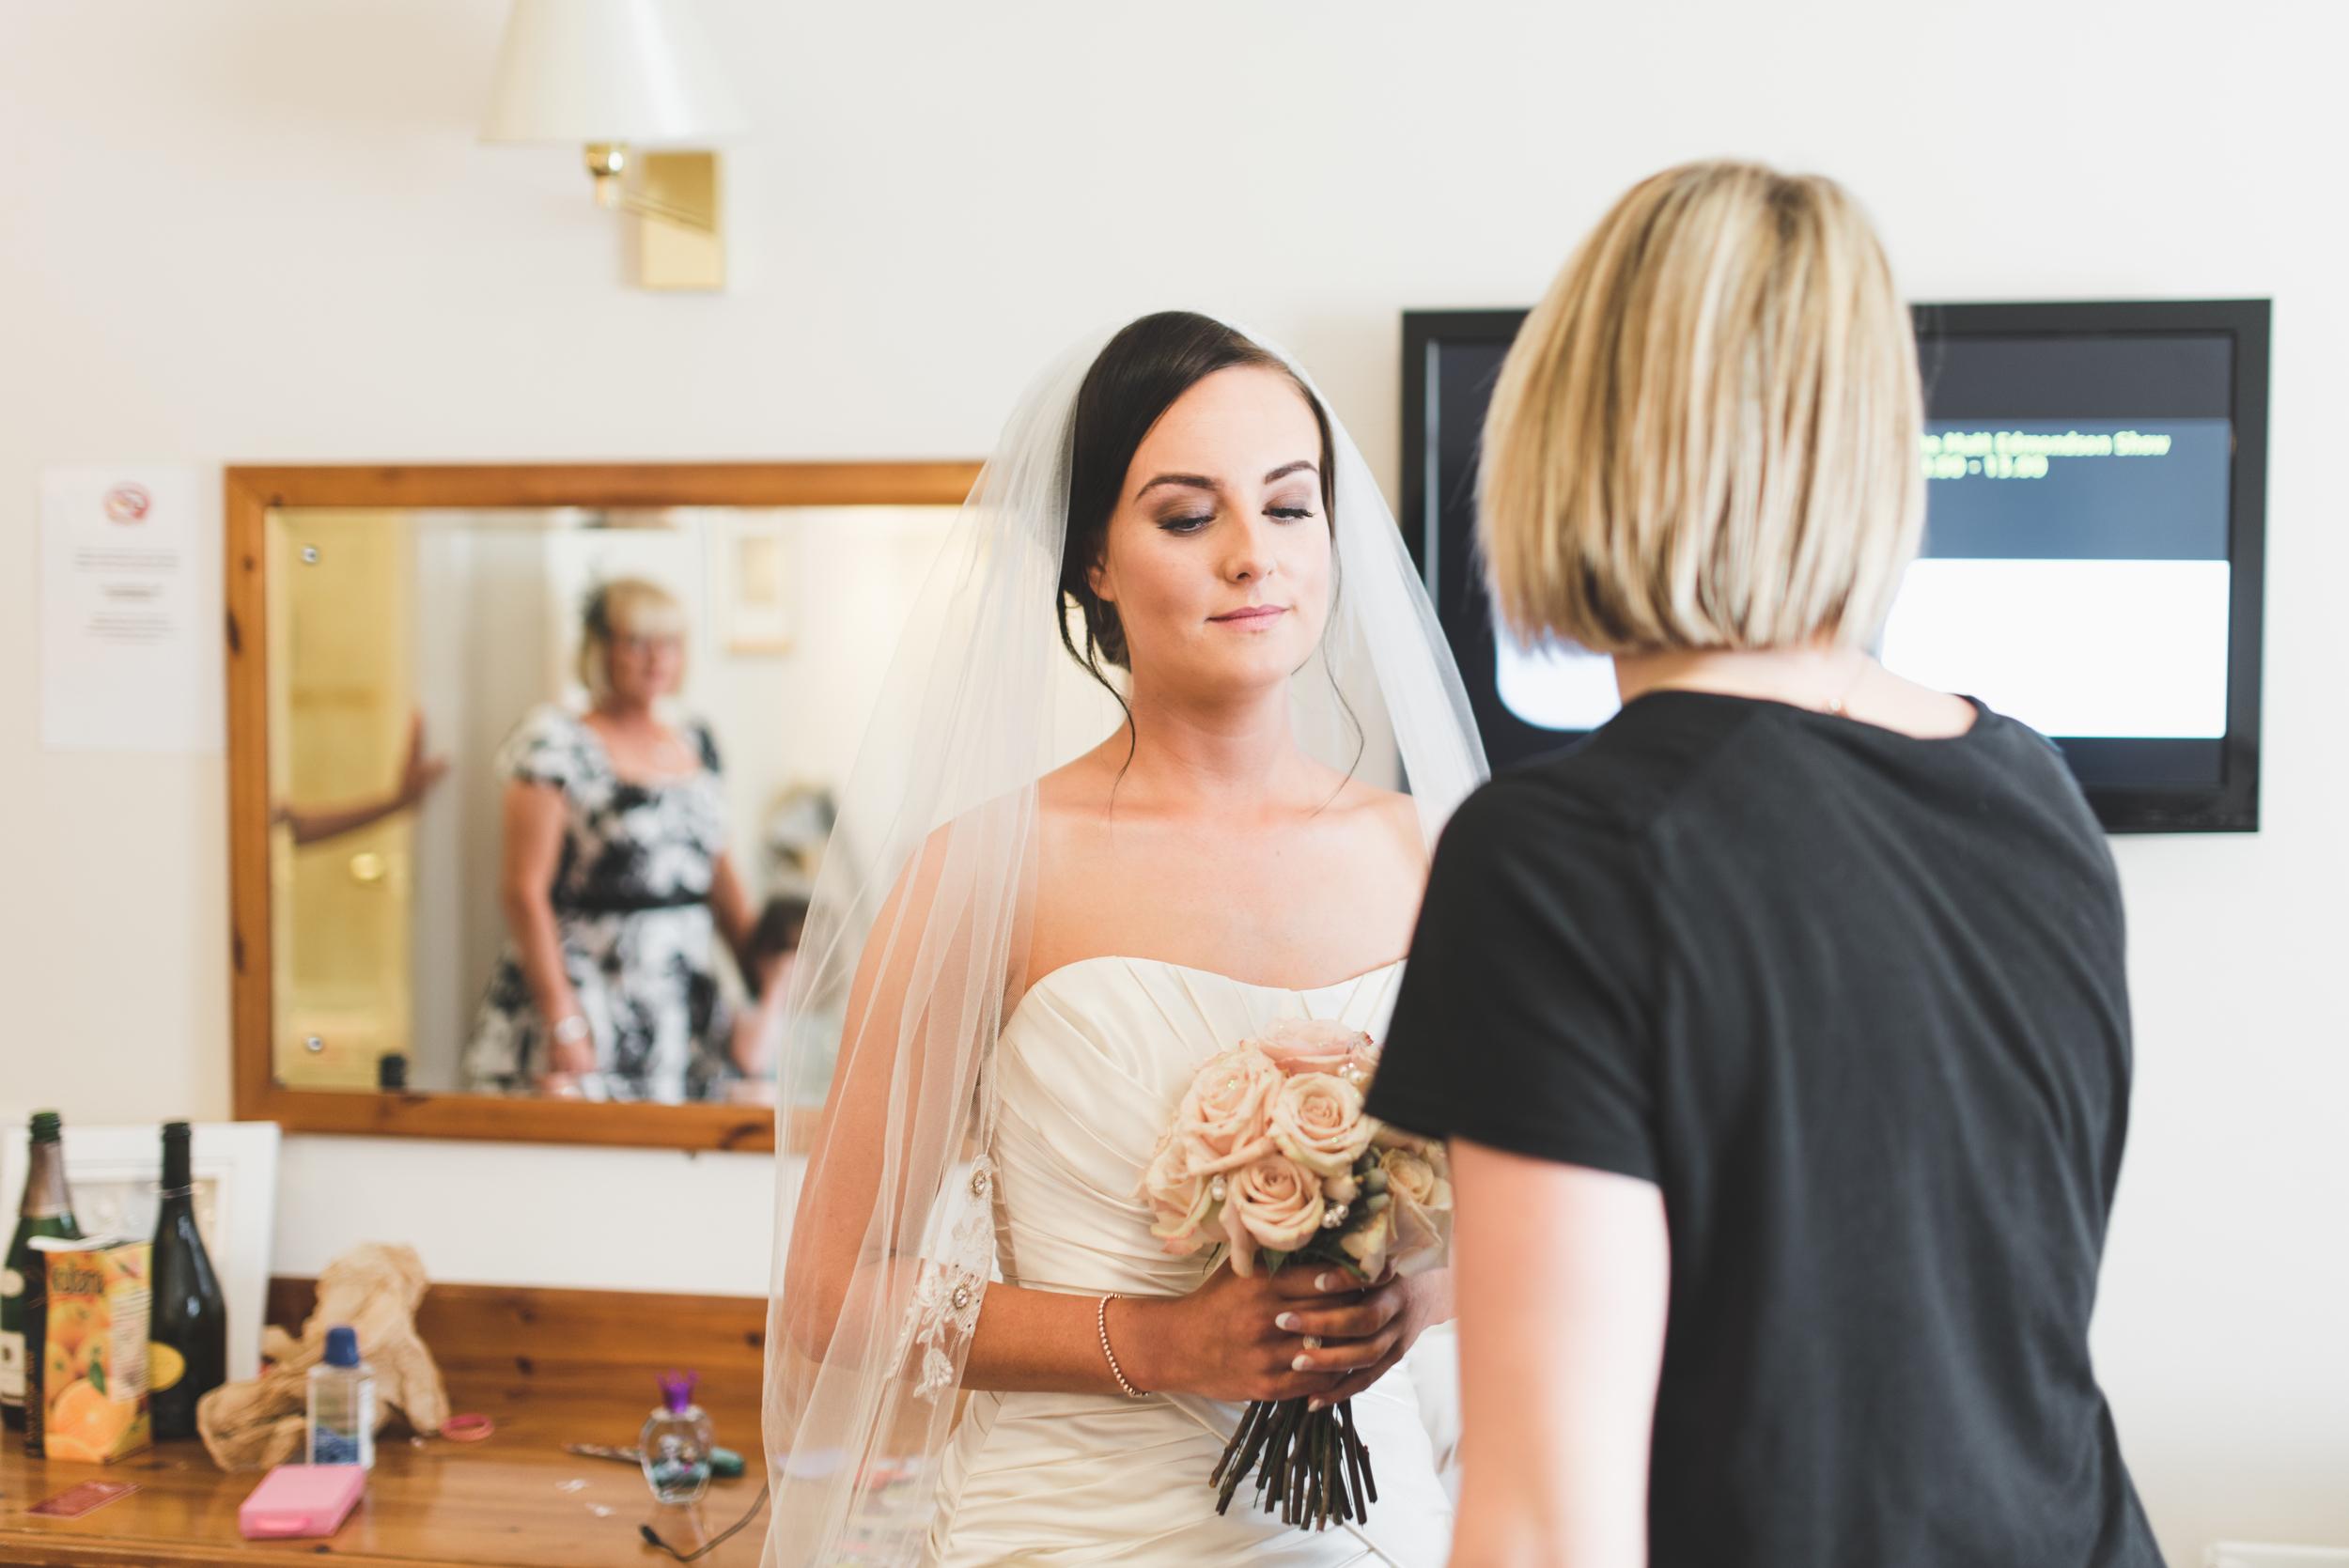 Northern_Ireland_Wedding_Photographer_Purephotoni_Dunsilly_Hotel_Bride_Getting_Ready